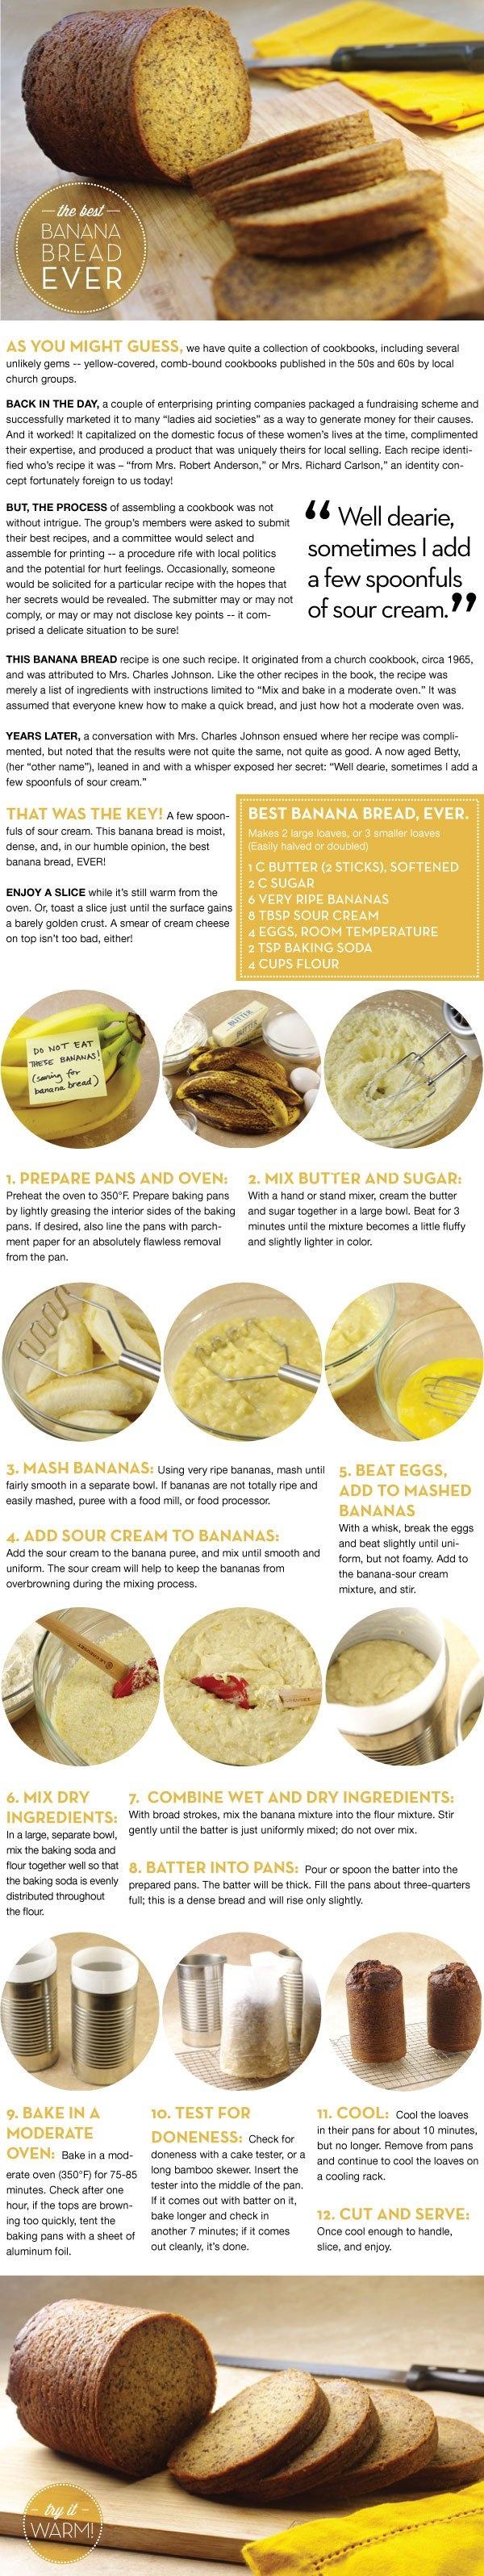 Banana bread   Breads and Breakfast   Pinterest